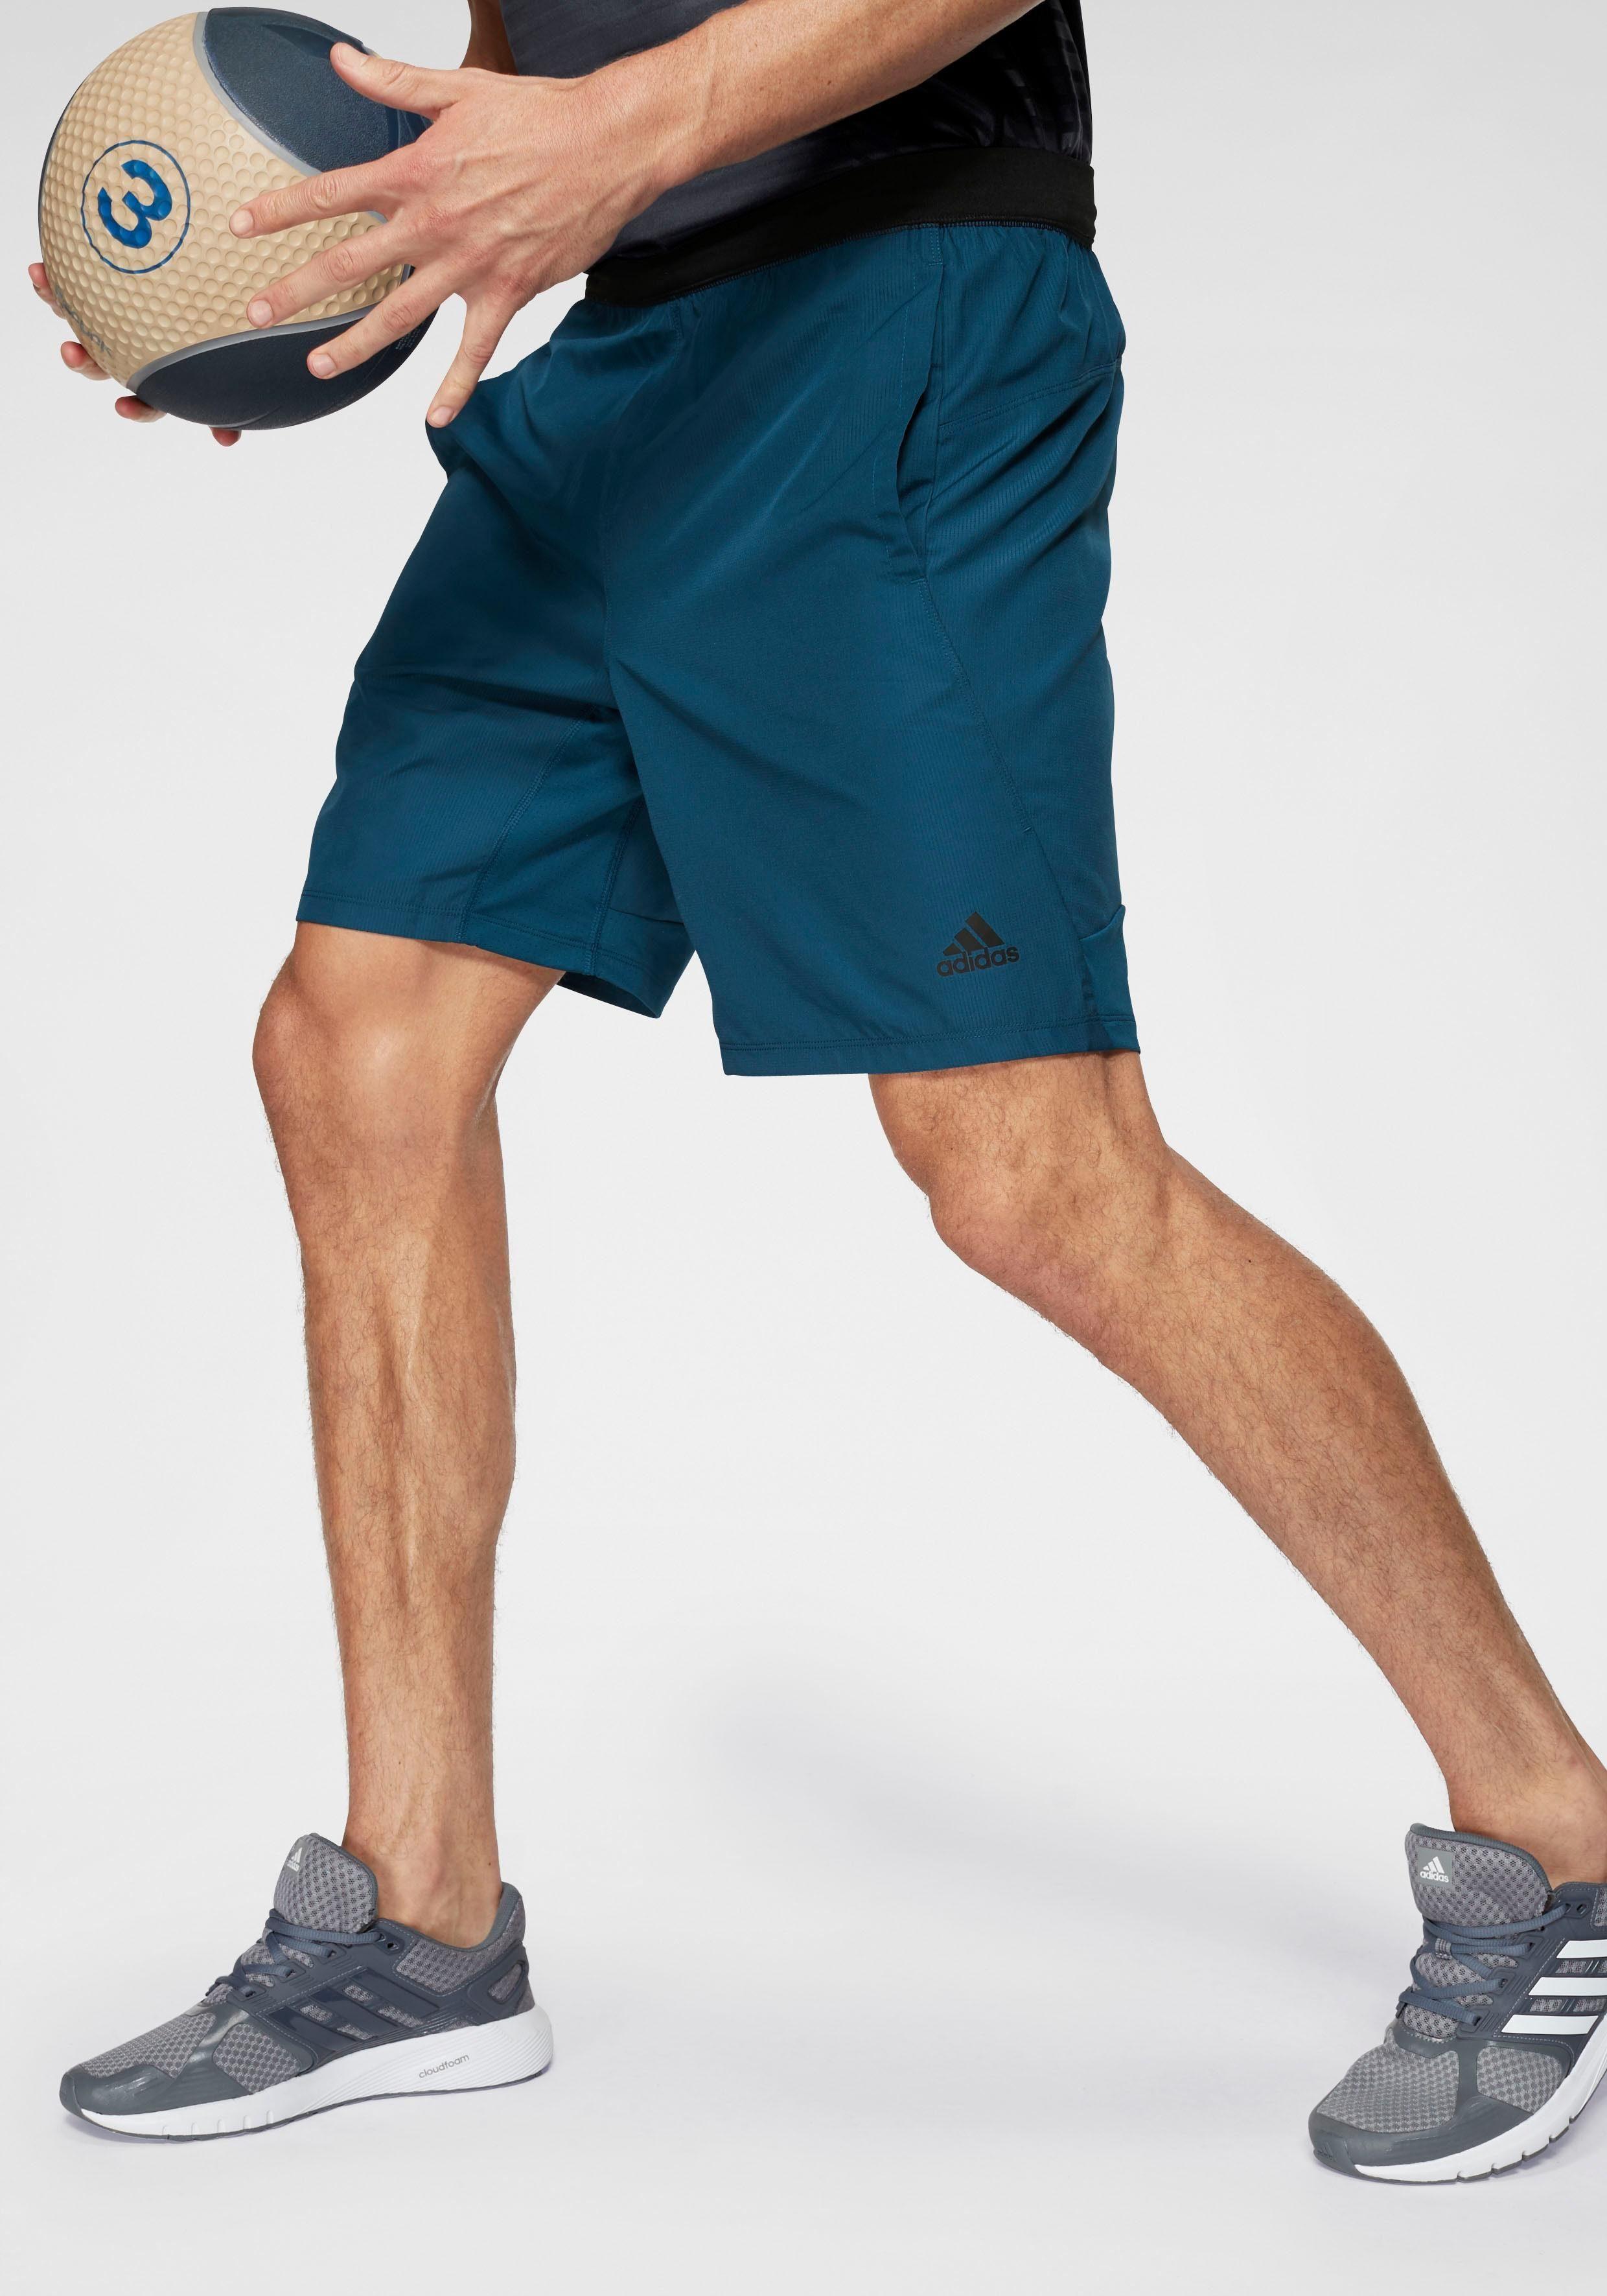 Asics Club Woven 7 Shorts Herren Blau online kaufen